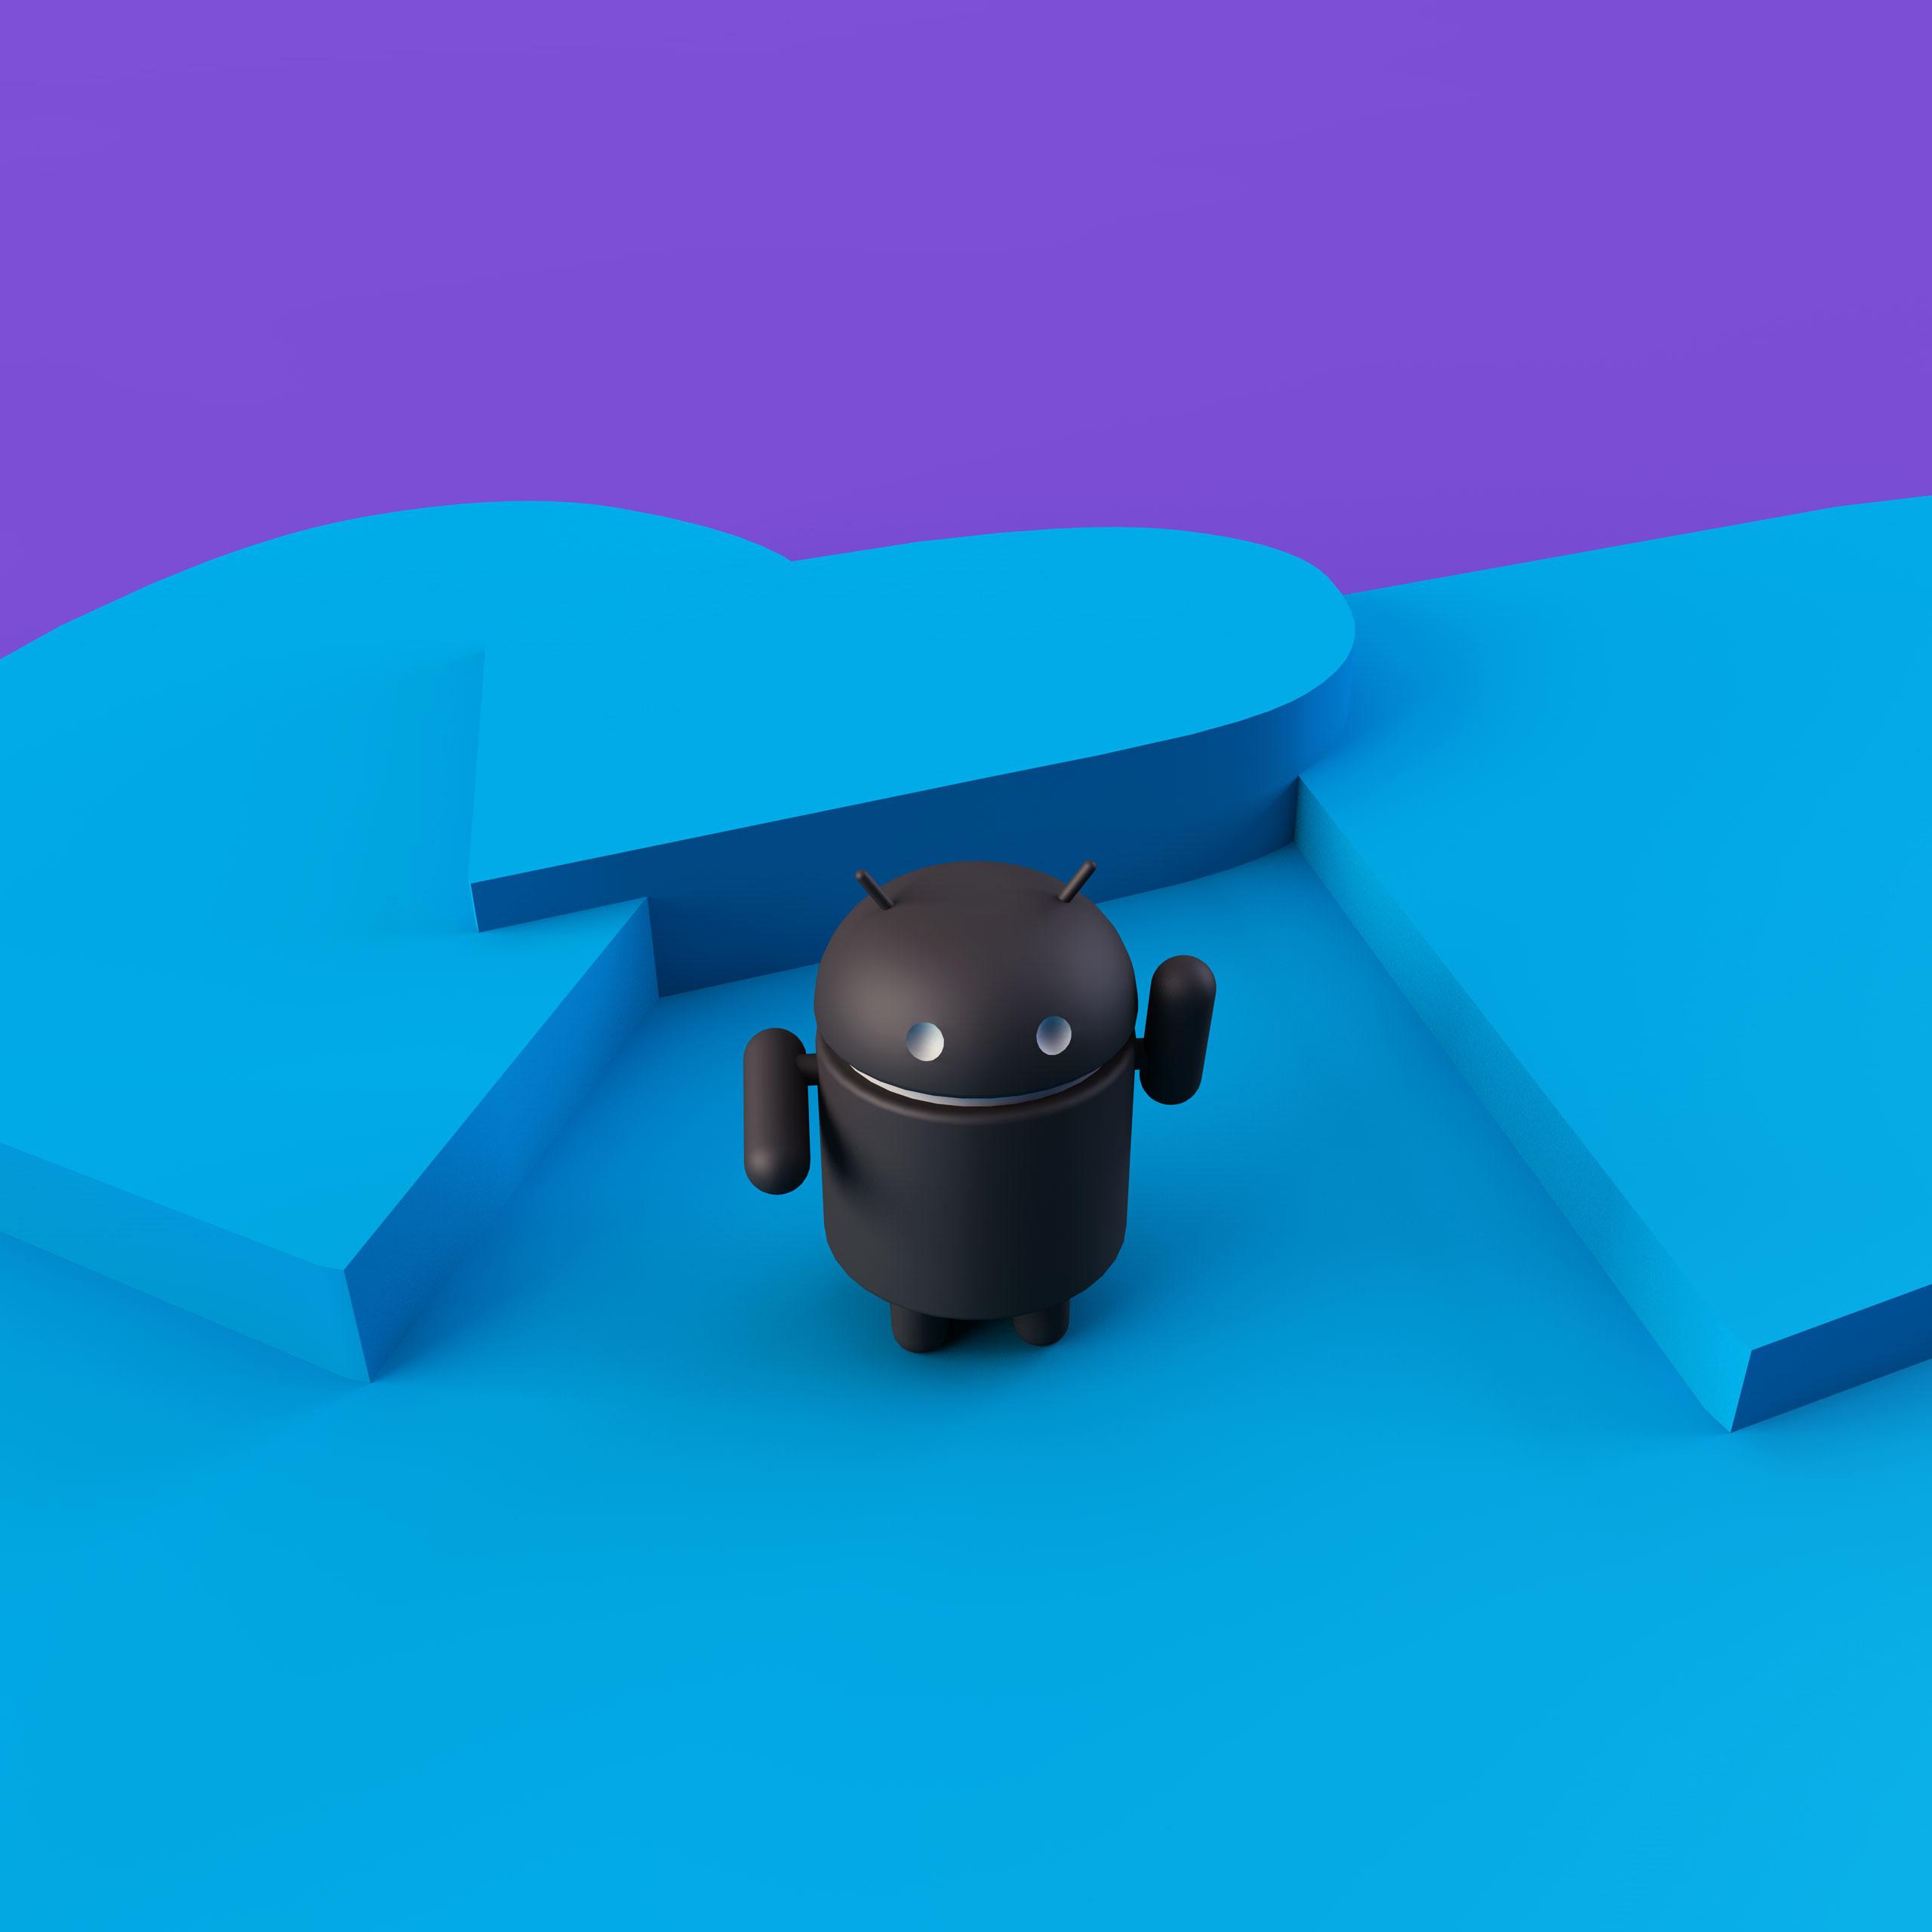 Android Robot 3d Wallpaper Design